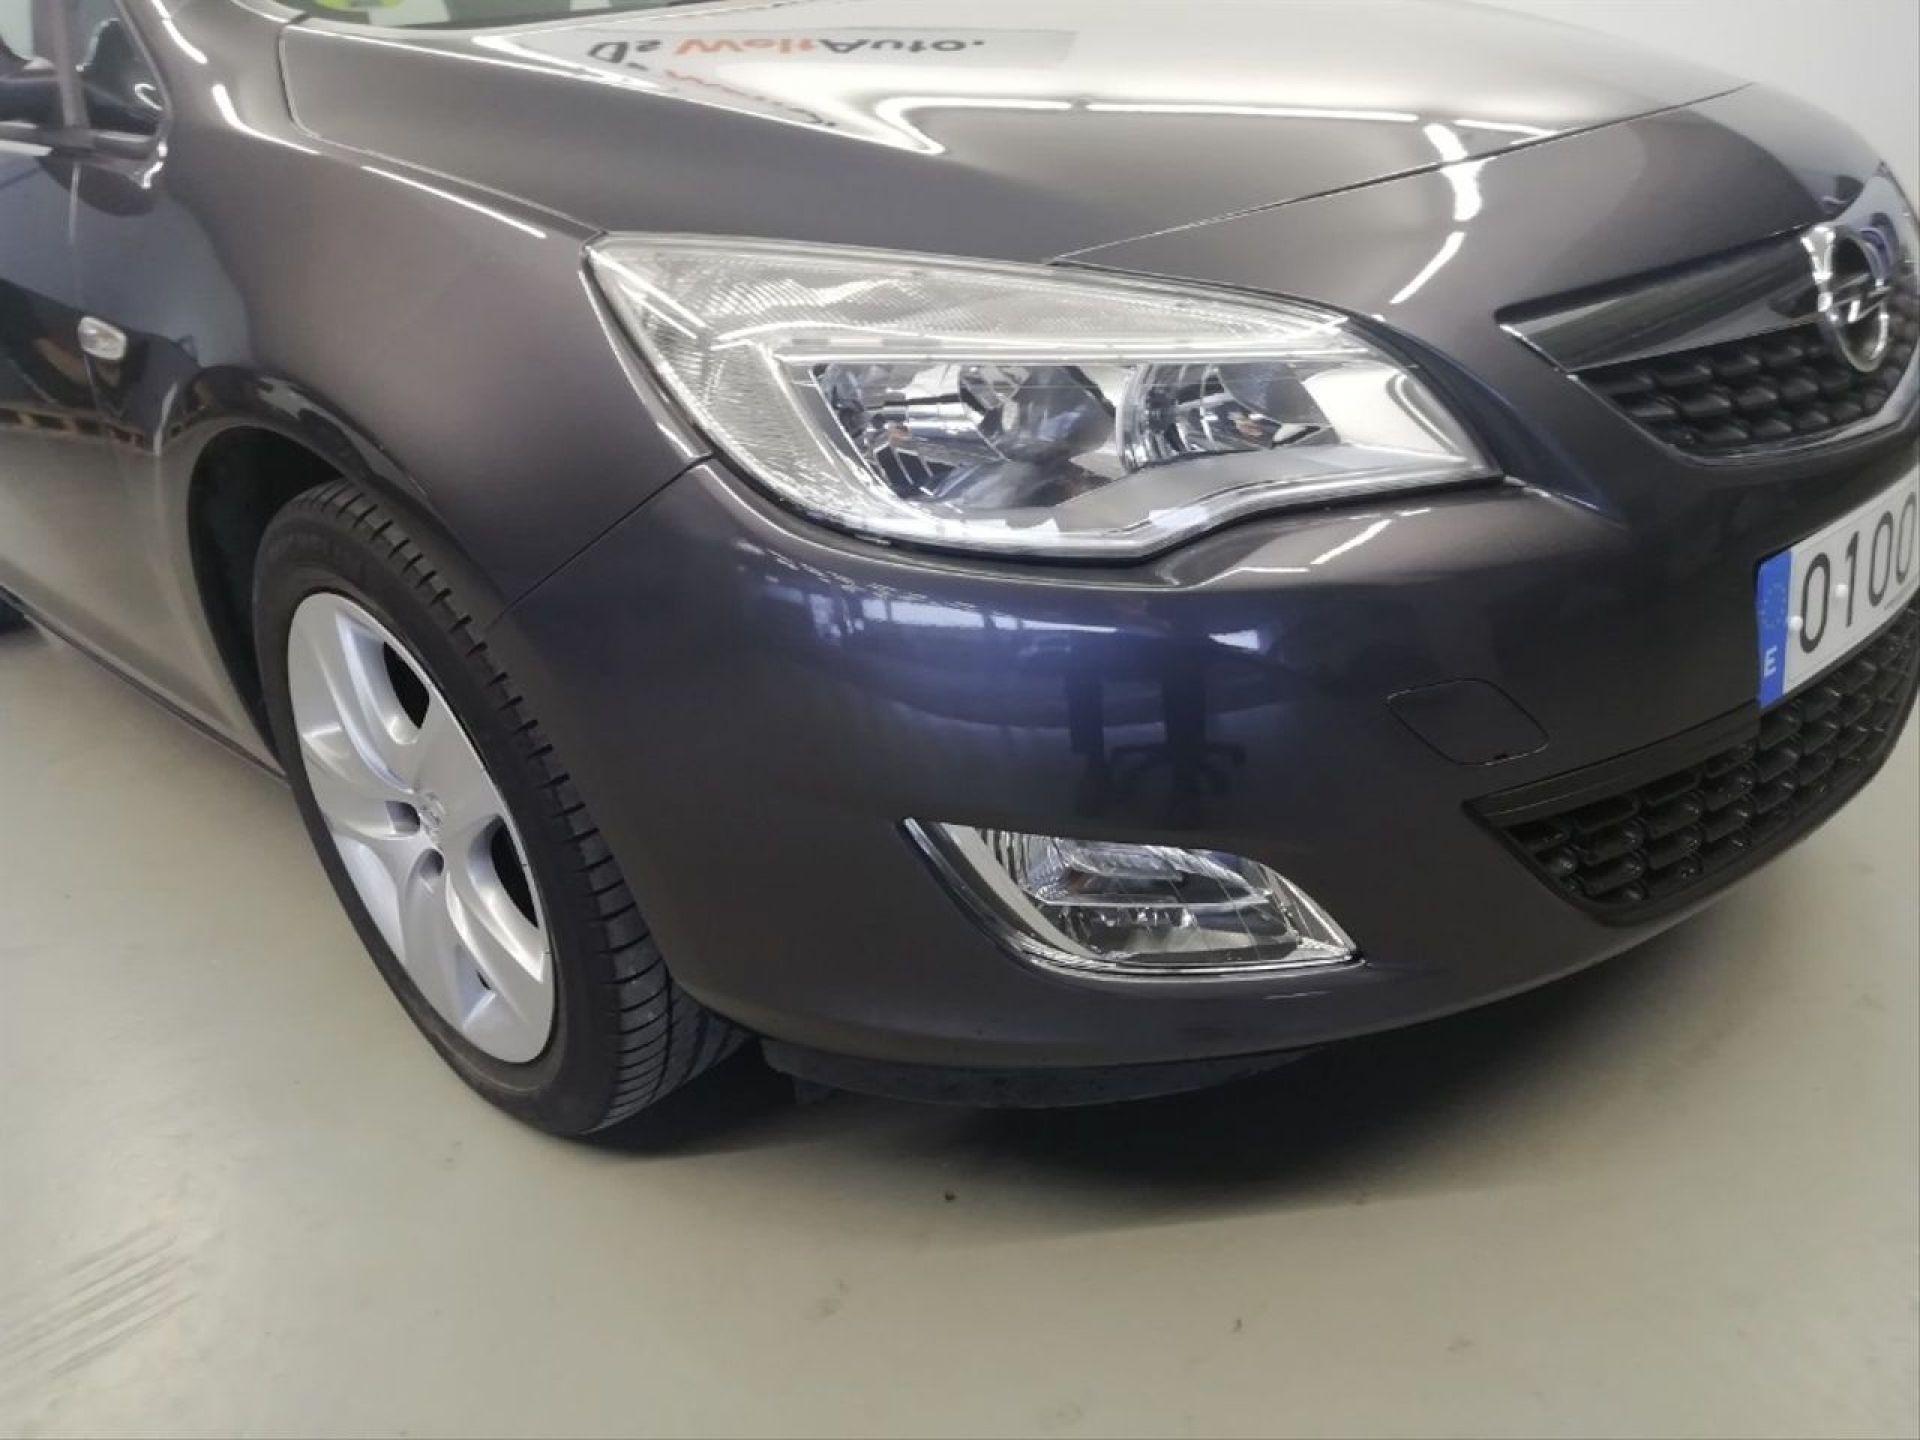 Opel Astra 1.7 CDTi S/S 110 CV Selective ST